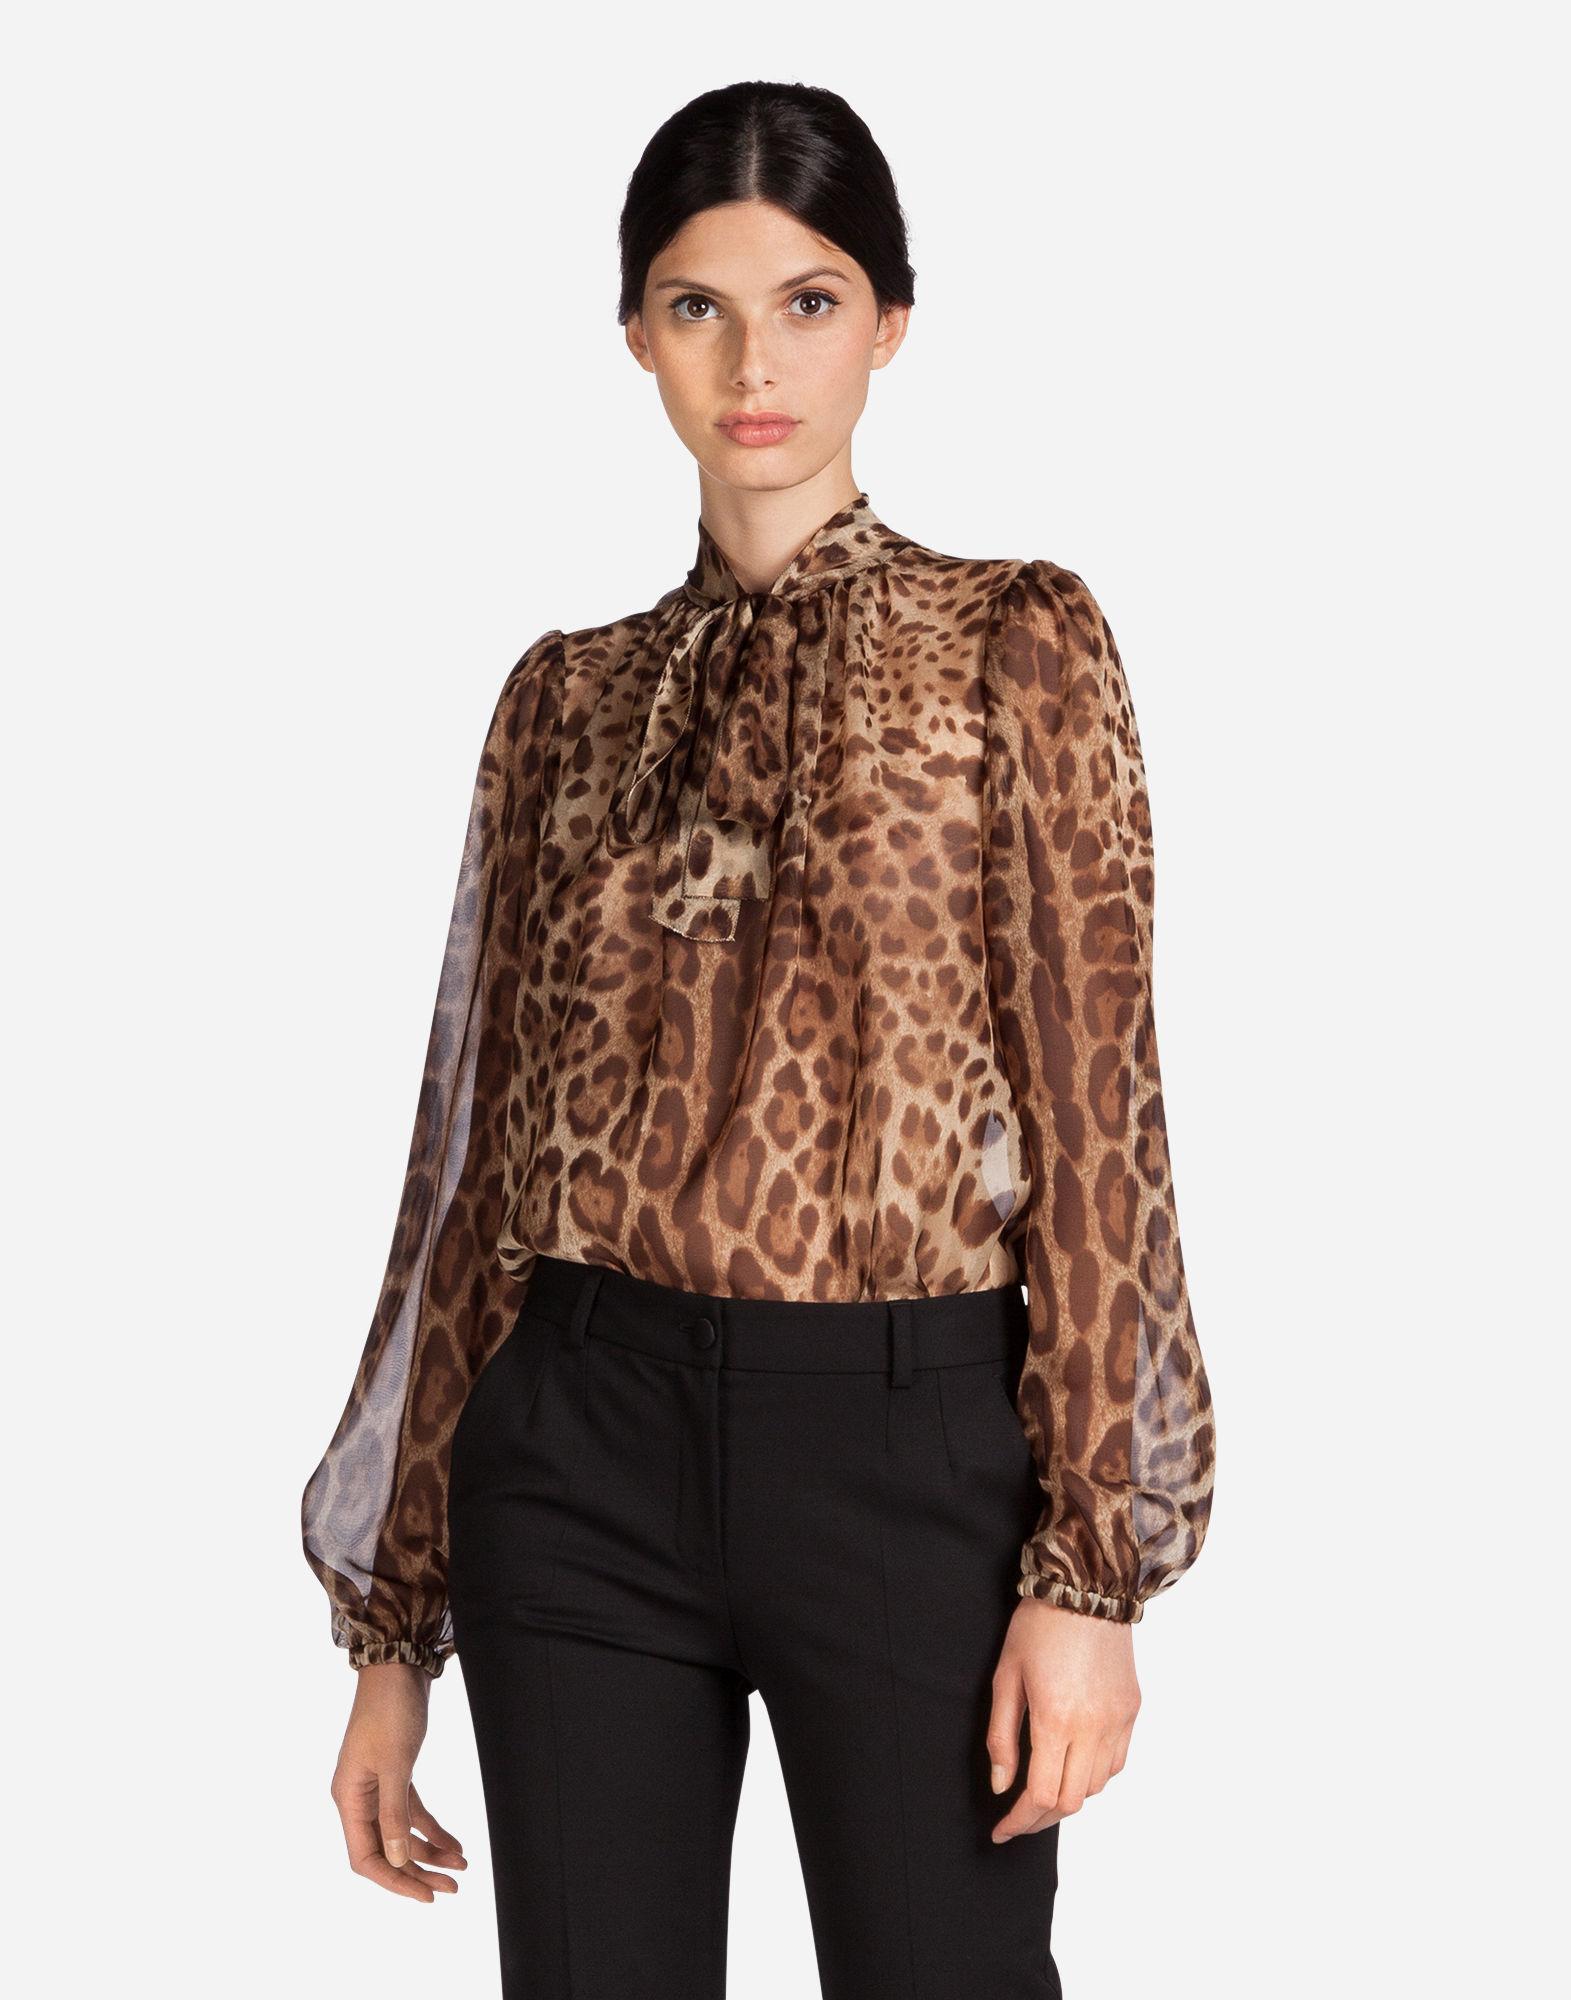 Dolce & Gabbana Printed Silk Blouse In Leo Print